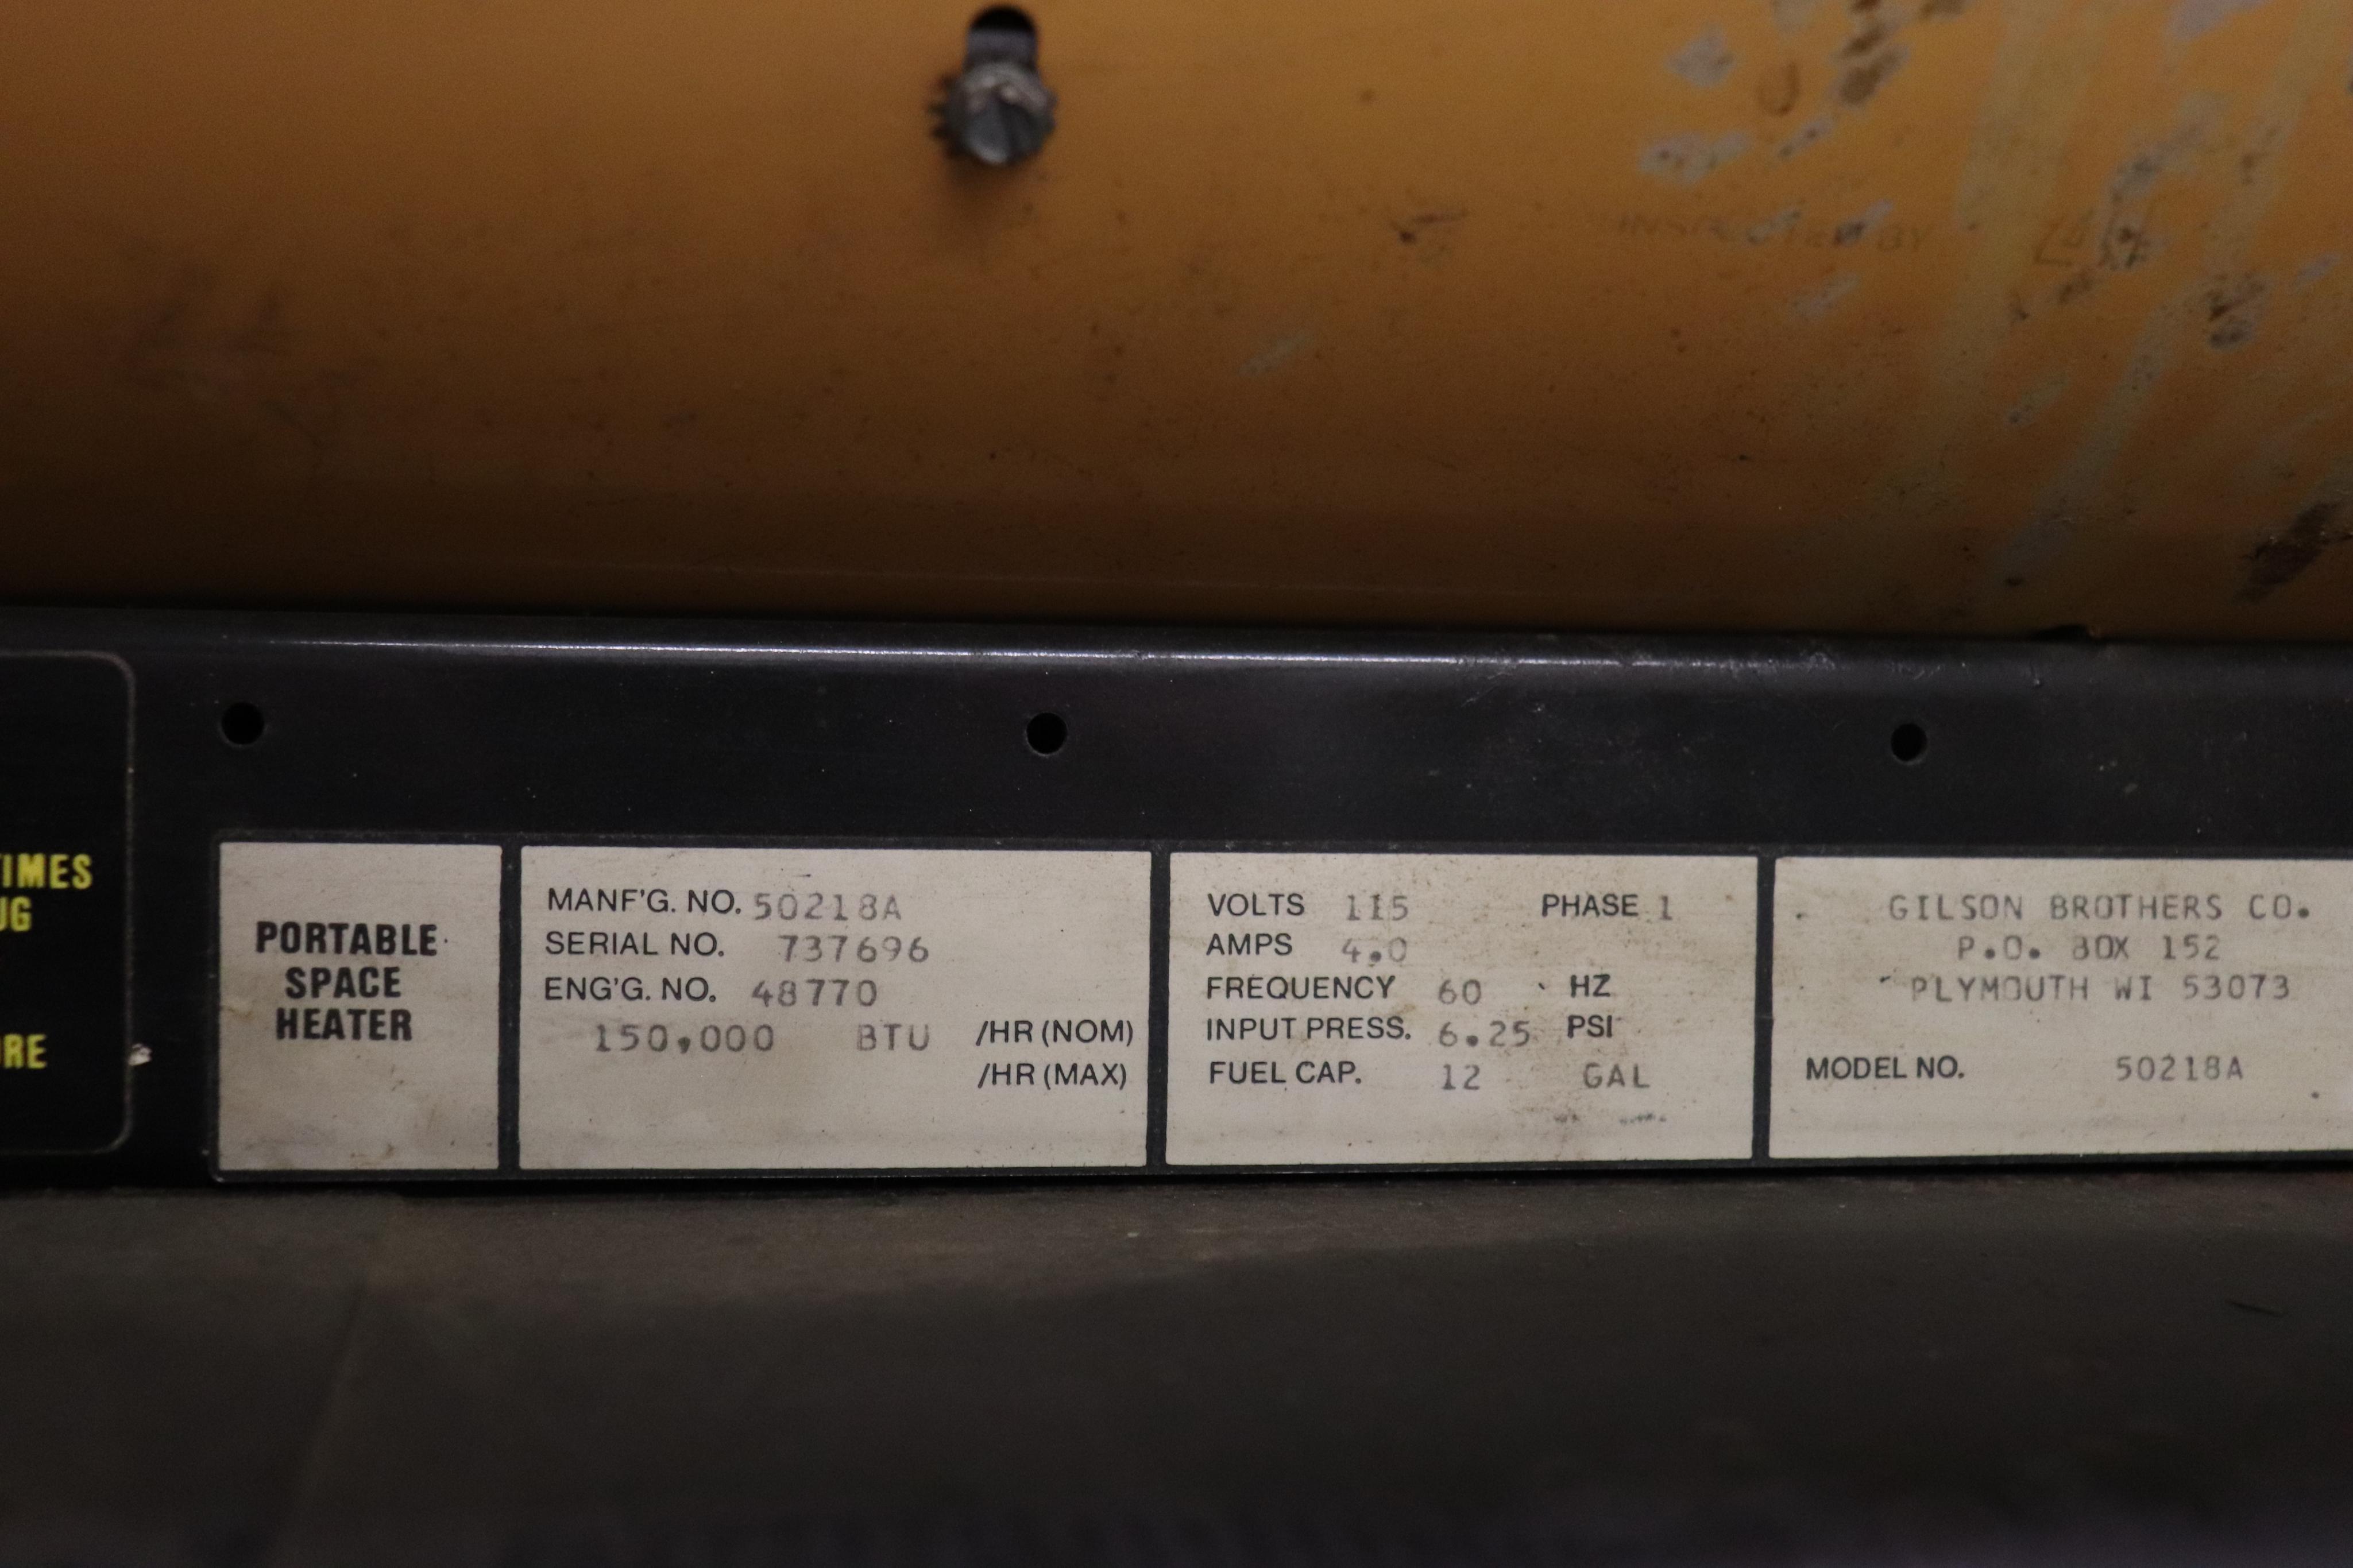 Porta - Heat 150,000 BTU portable space heater - Image 2 of 2